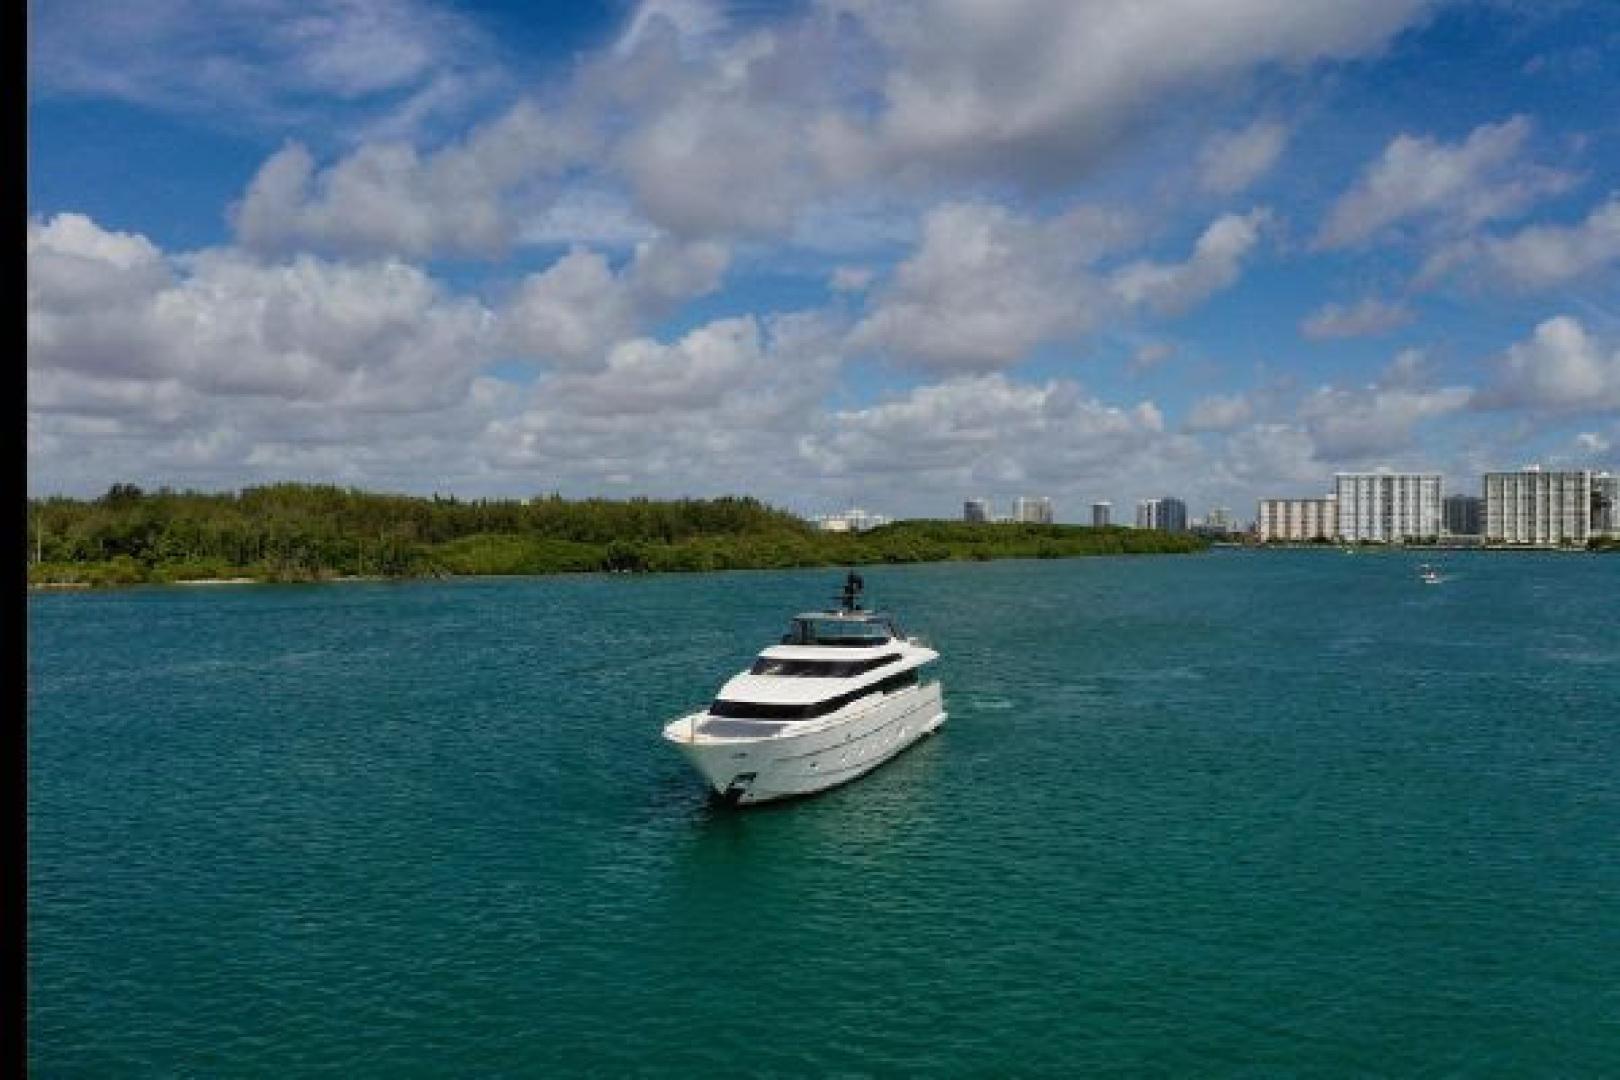 Sanlorenzo-SL94 2012-Sanlorenzo SL94 Aventura-Florida-United States-1637117 | Thumbnail